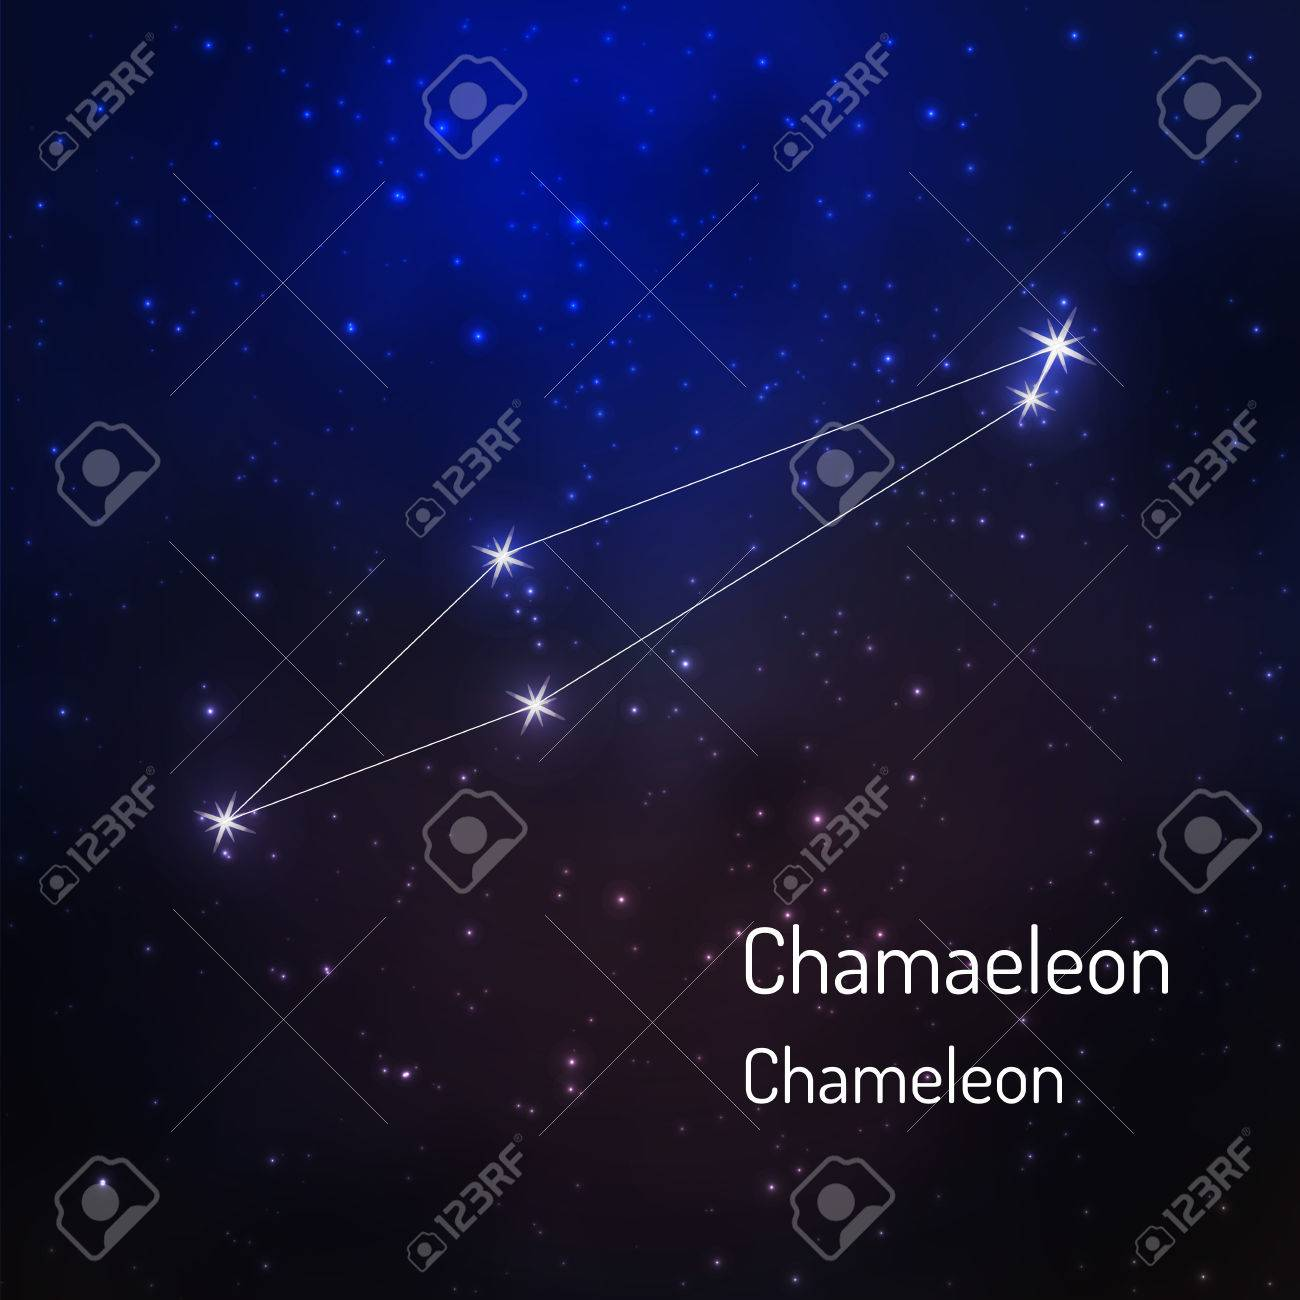 Chameleon constellation in the night starry sky. Vector illustration - 73033686